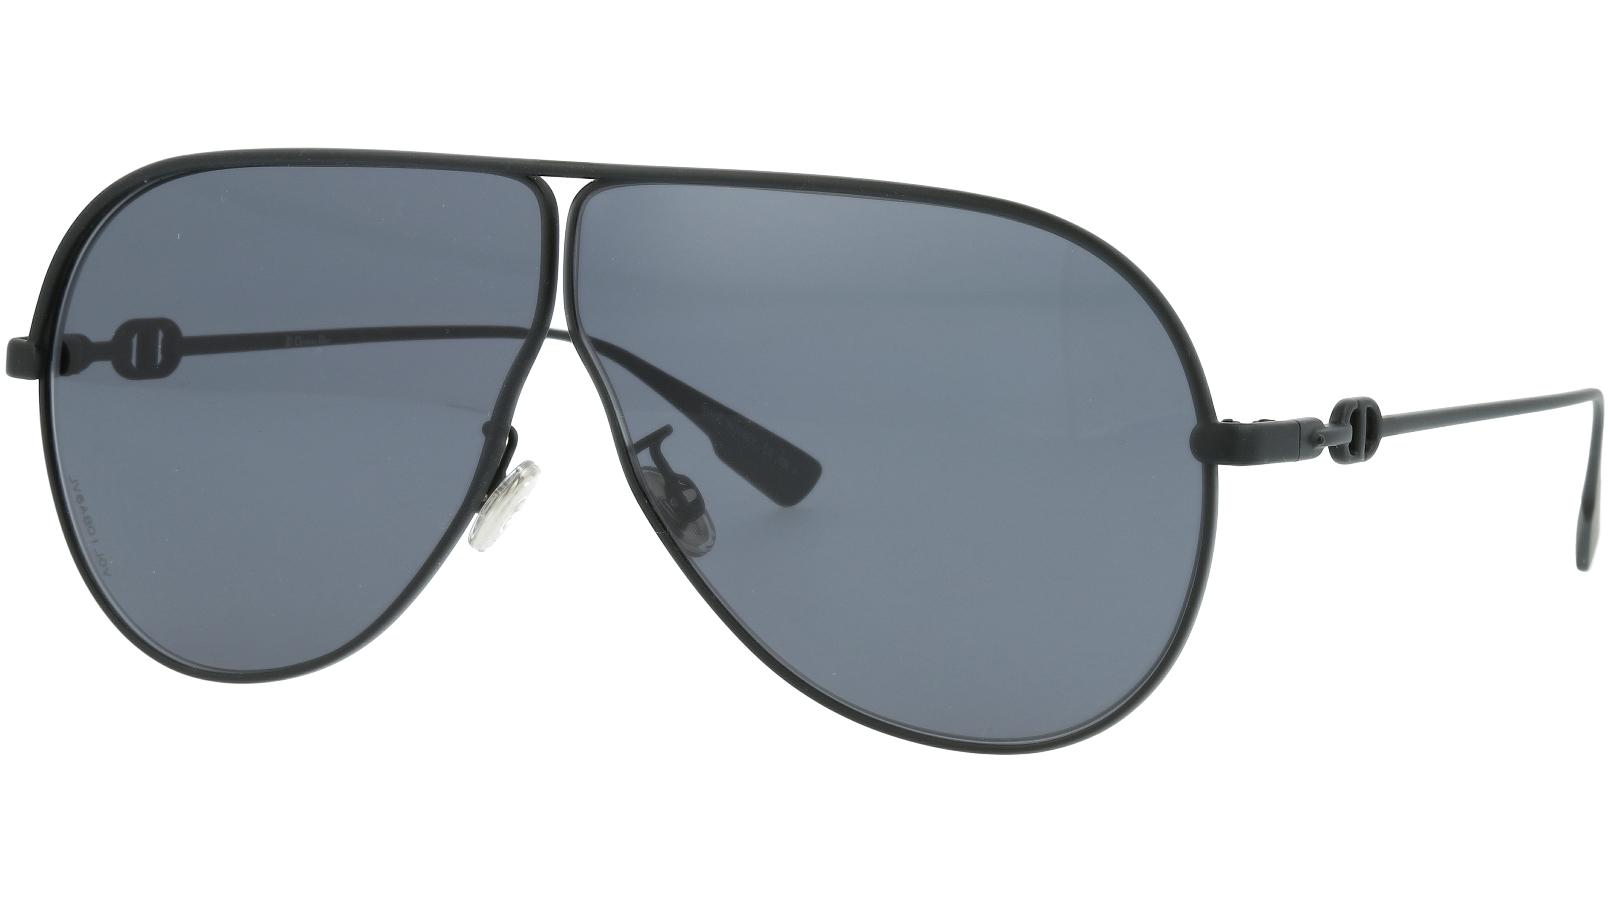 Dior CAMP 0032K 66 MATT Sunglasses